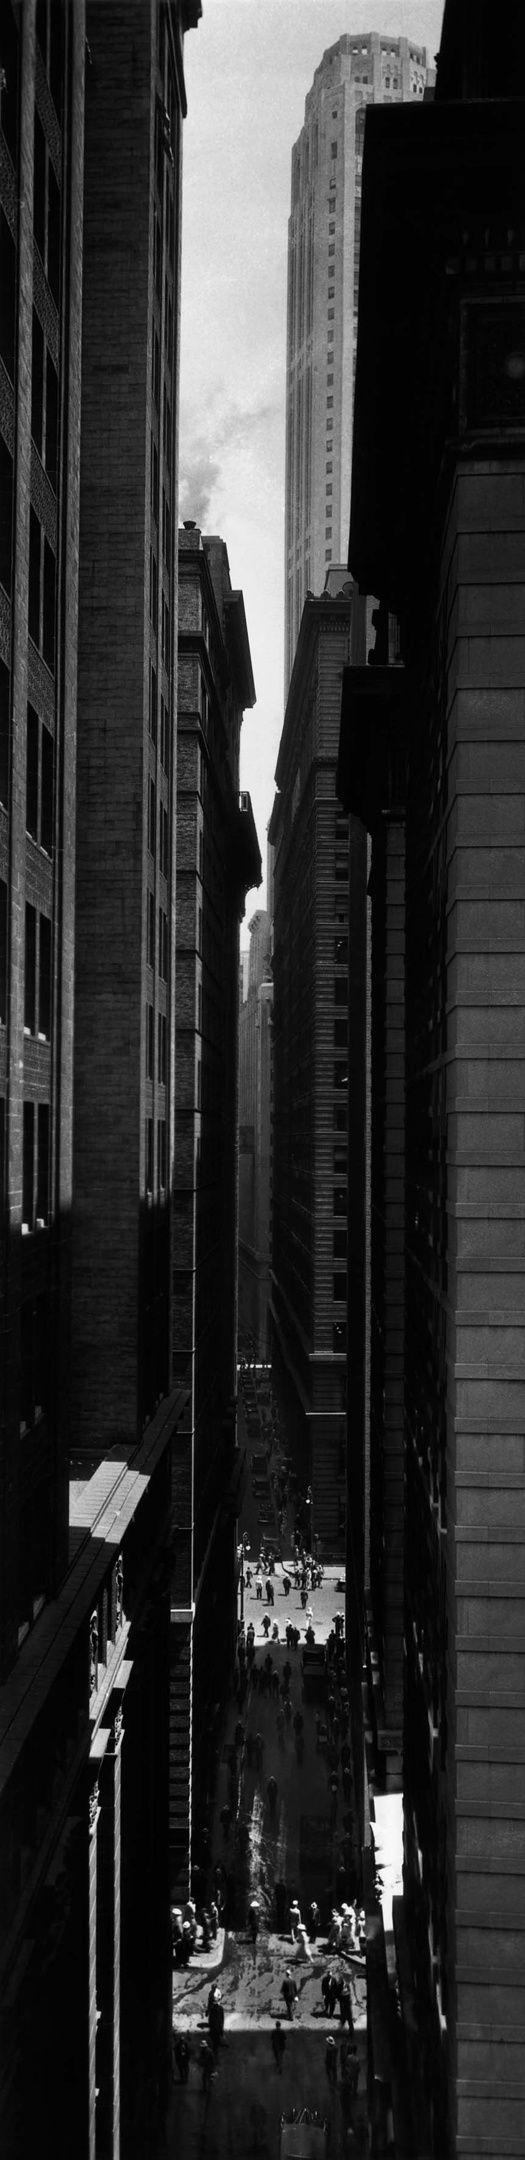 Berenice Abbott, Exchange Place, New York, 1933.